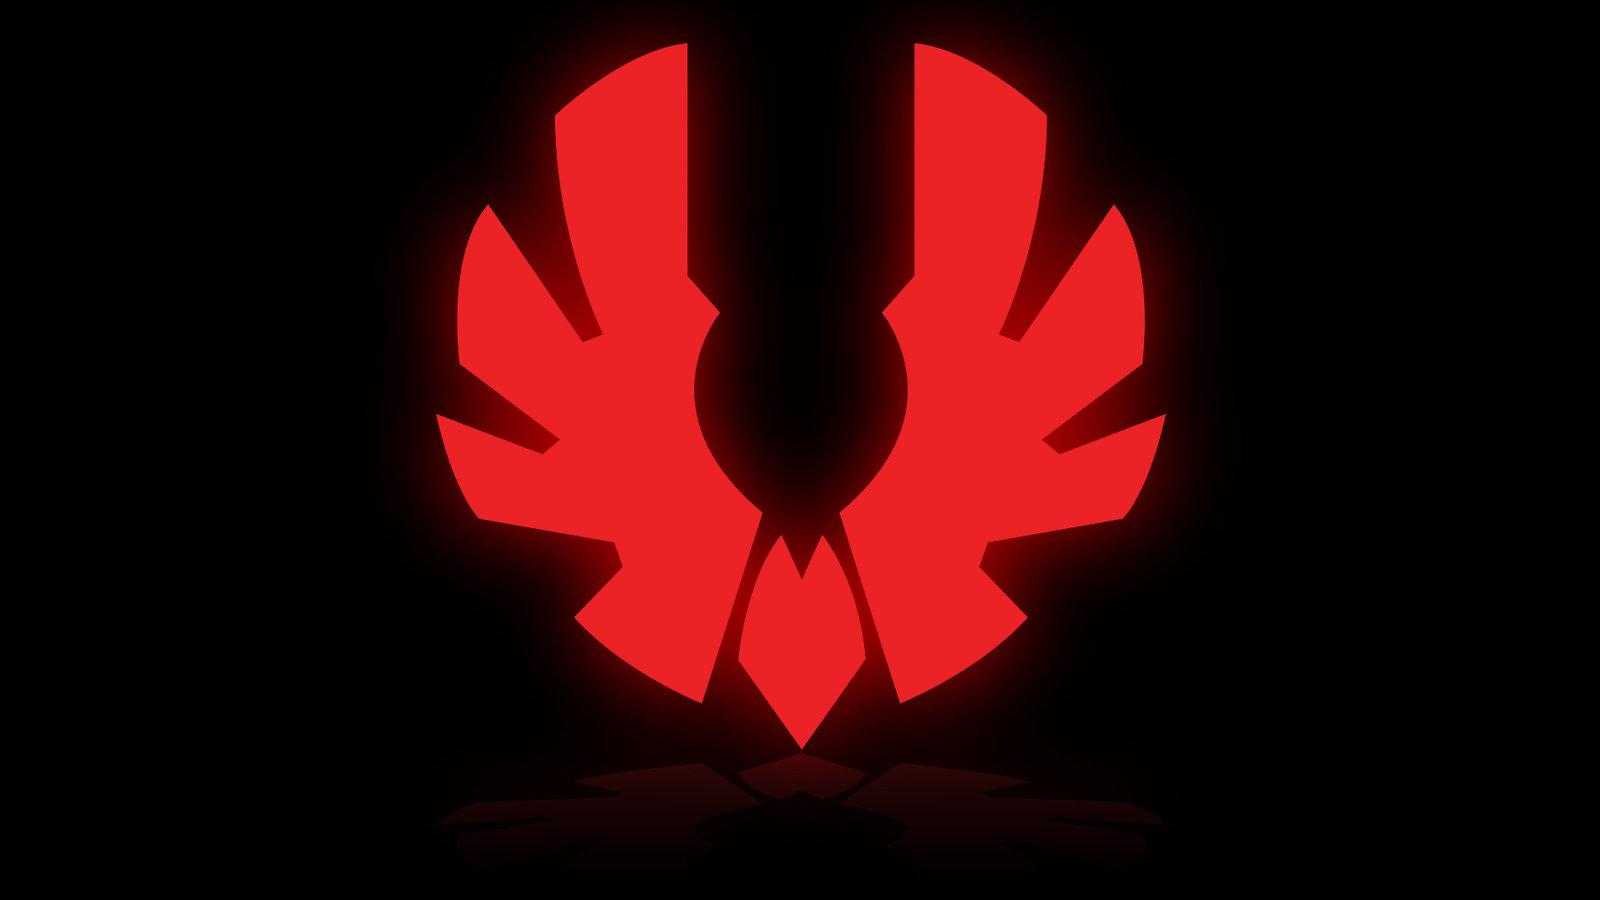 BitFenix Logo   Glow and Reflection   Black by NoX Troniq on 1600x900